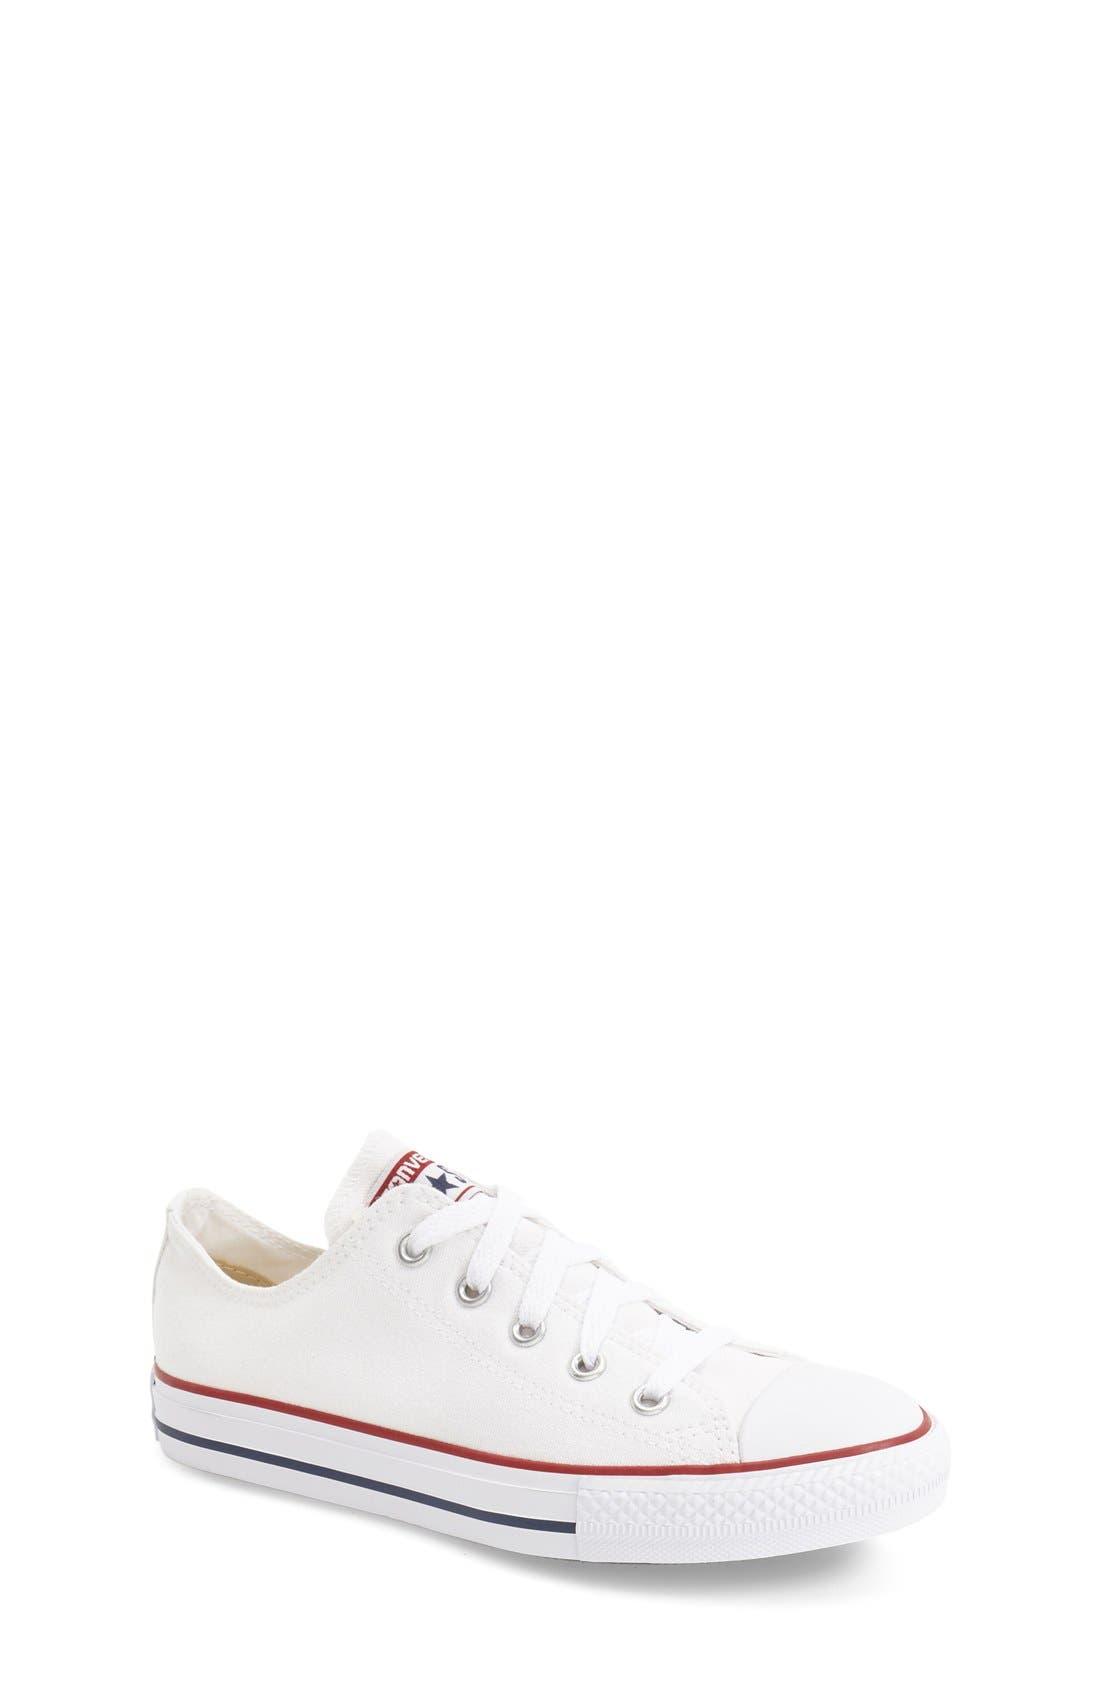 Converse Chuck Taylor® Sneaker (Toddler, Little Kid & Big Kid)